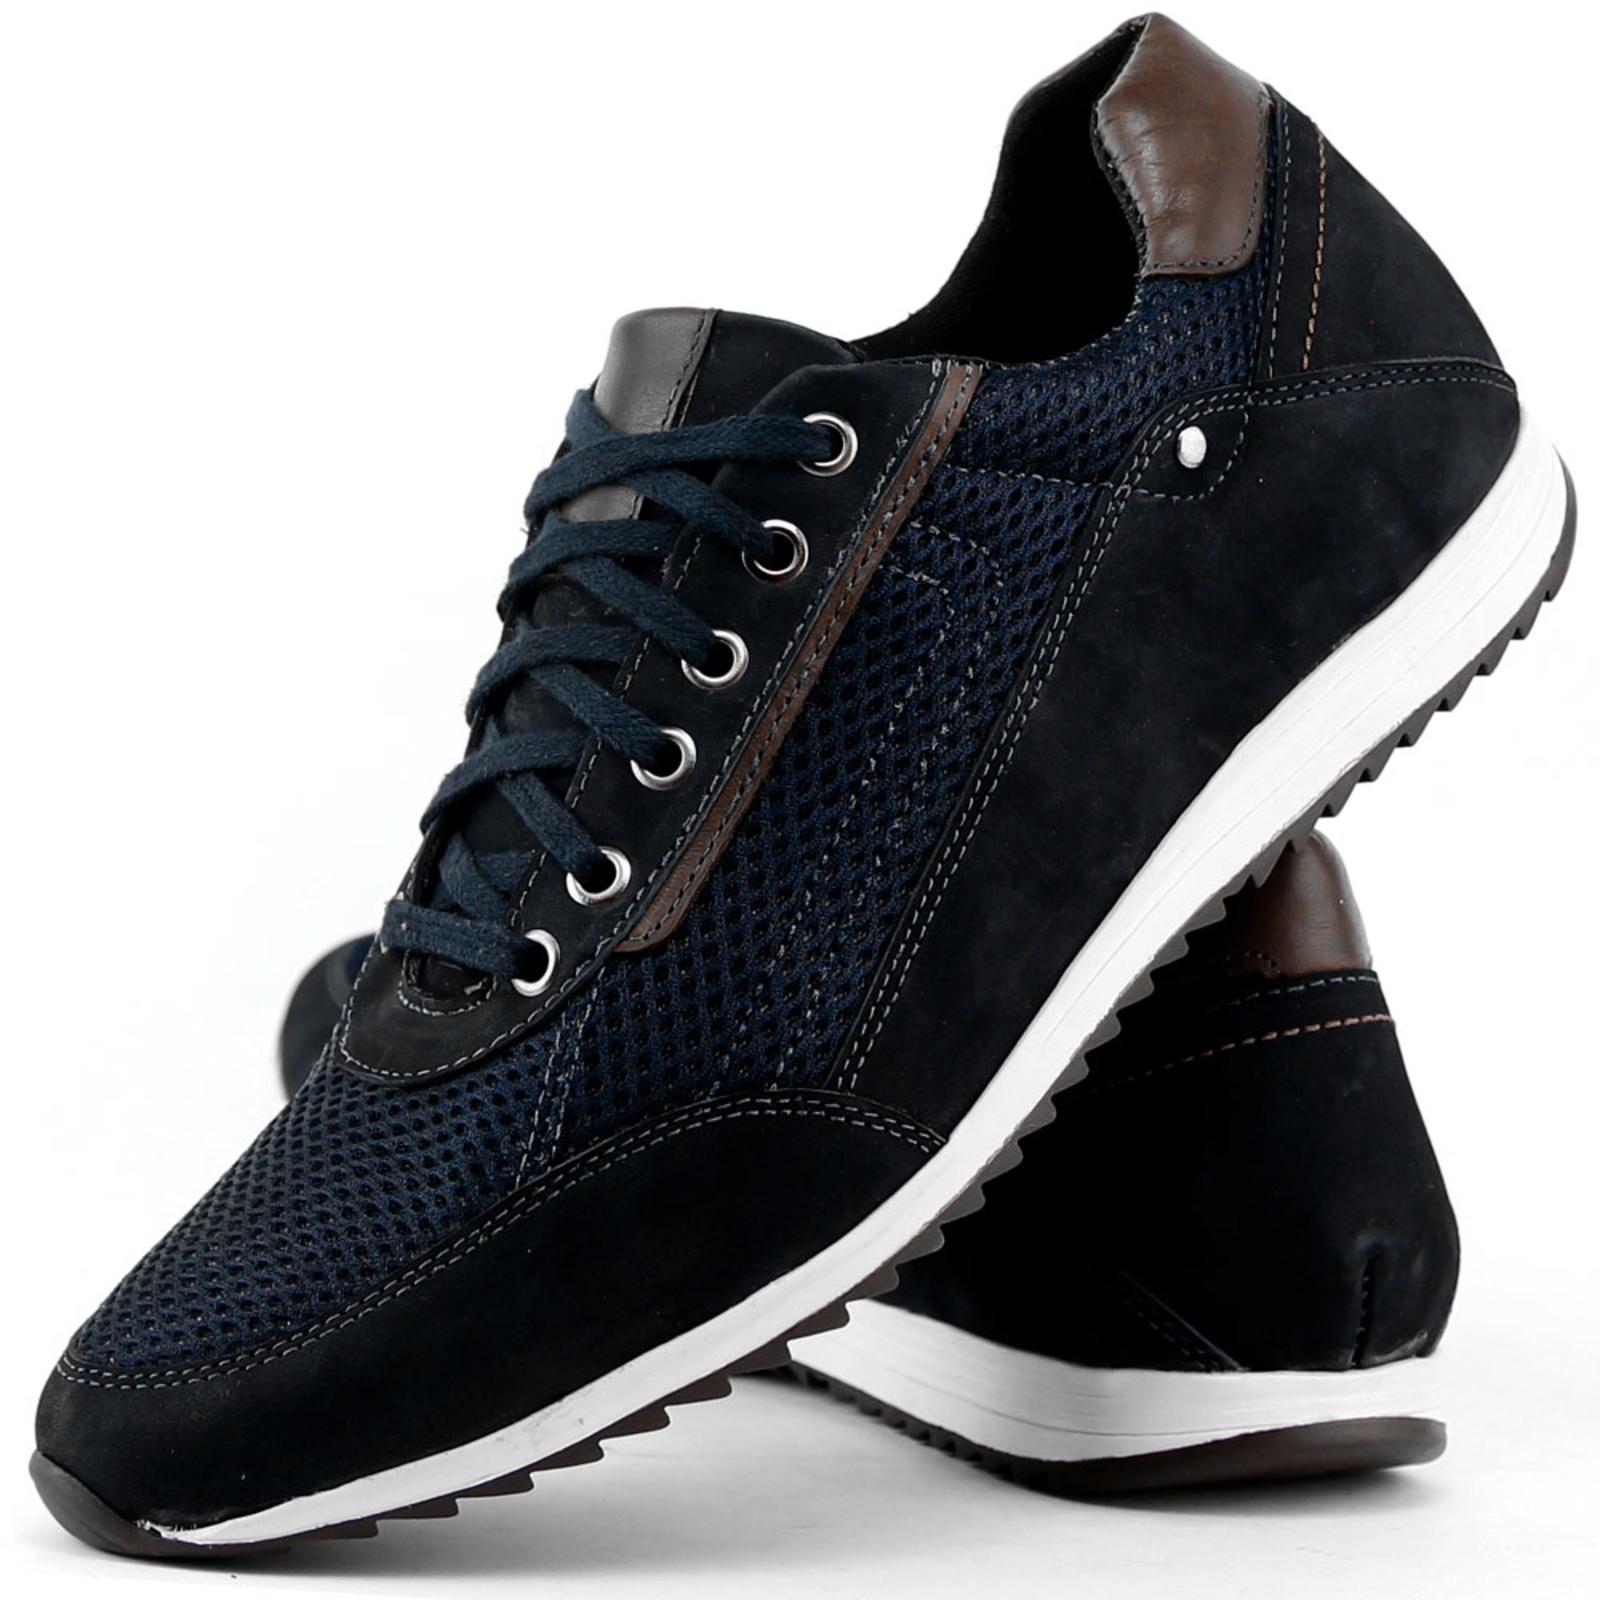 a68746881 sapatenis tênis casual couro jogger jogging masculino dhl | Shoes |  Sapatênis, Tenis casual, Sapatênis masculino